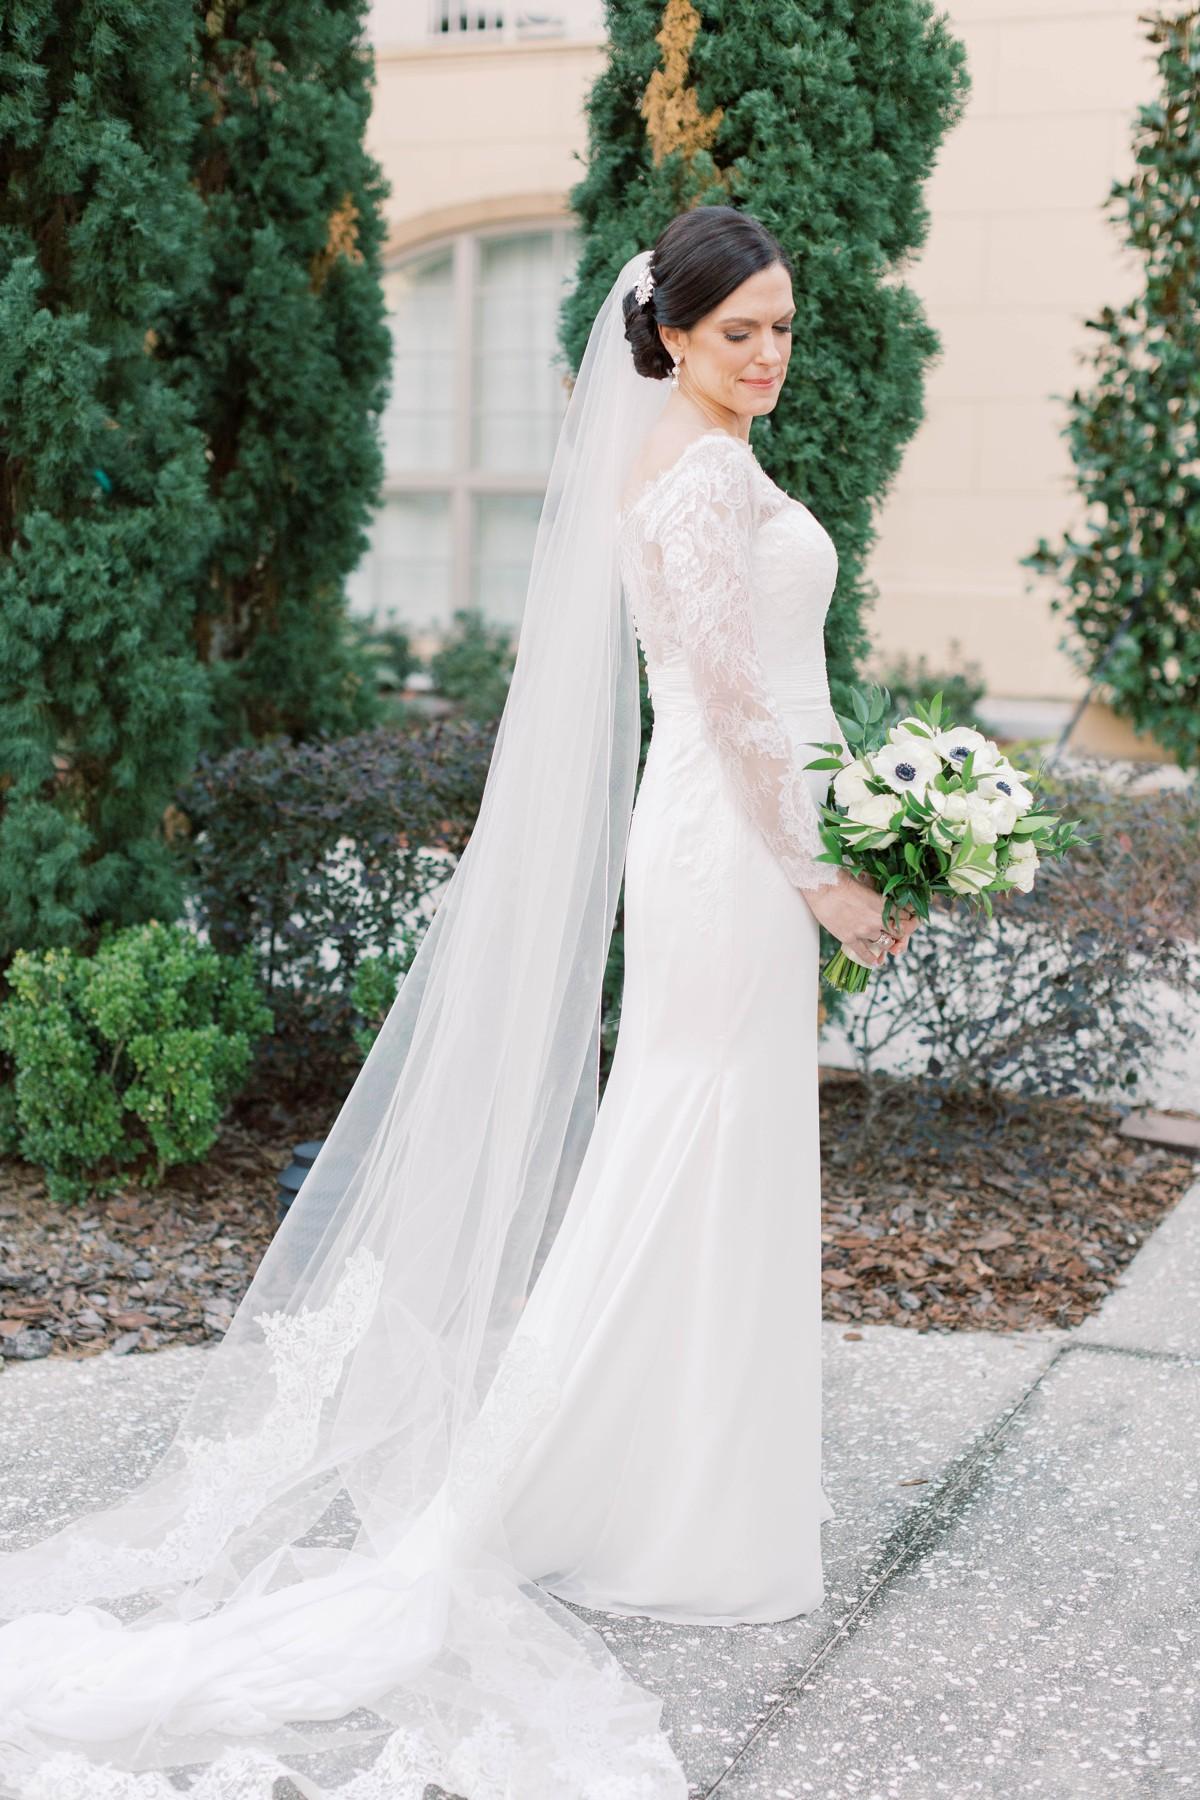 Alfond-Inn-Wedding-Winter-Park-Wedding-Photographer-Chantell-Rae-Photography_0027.jpg